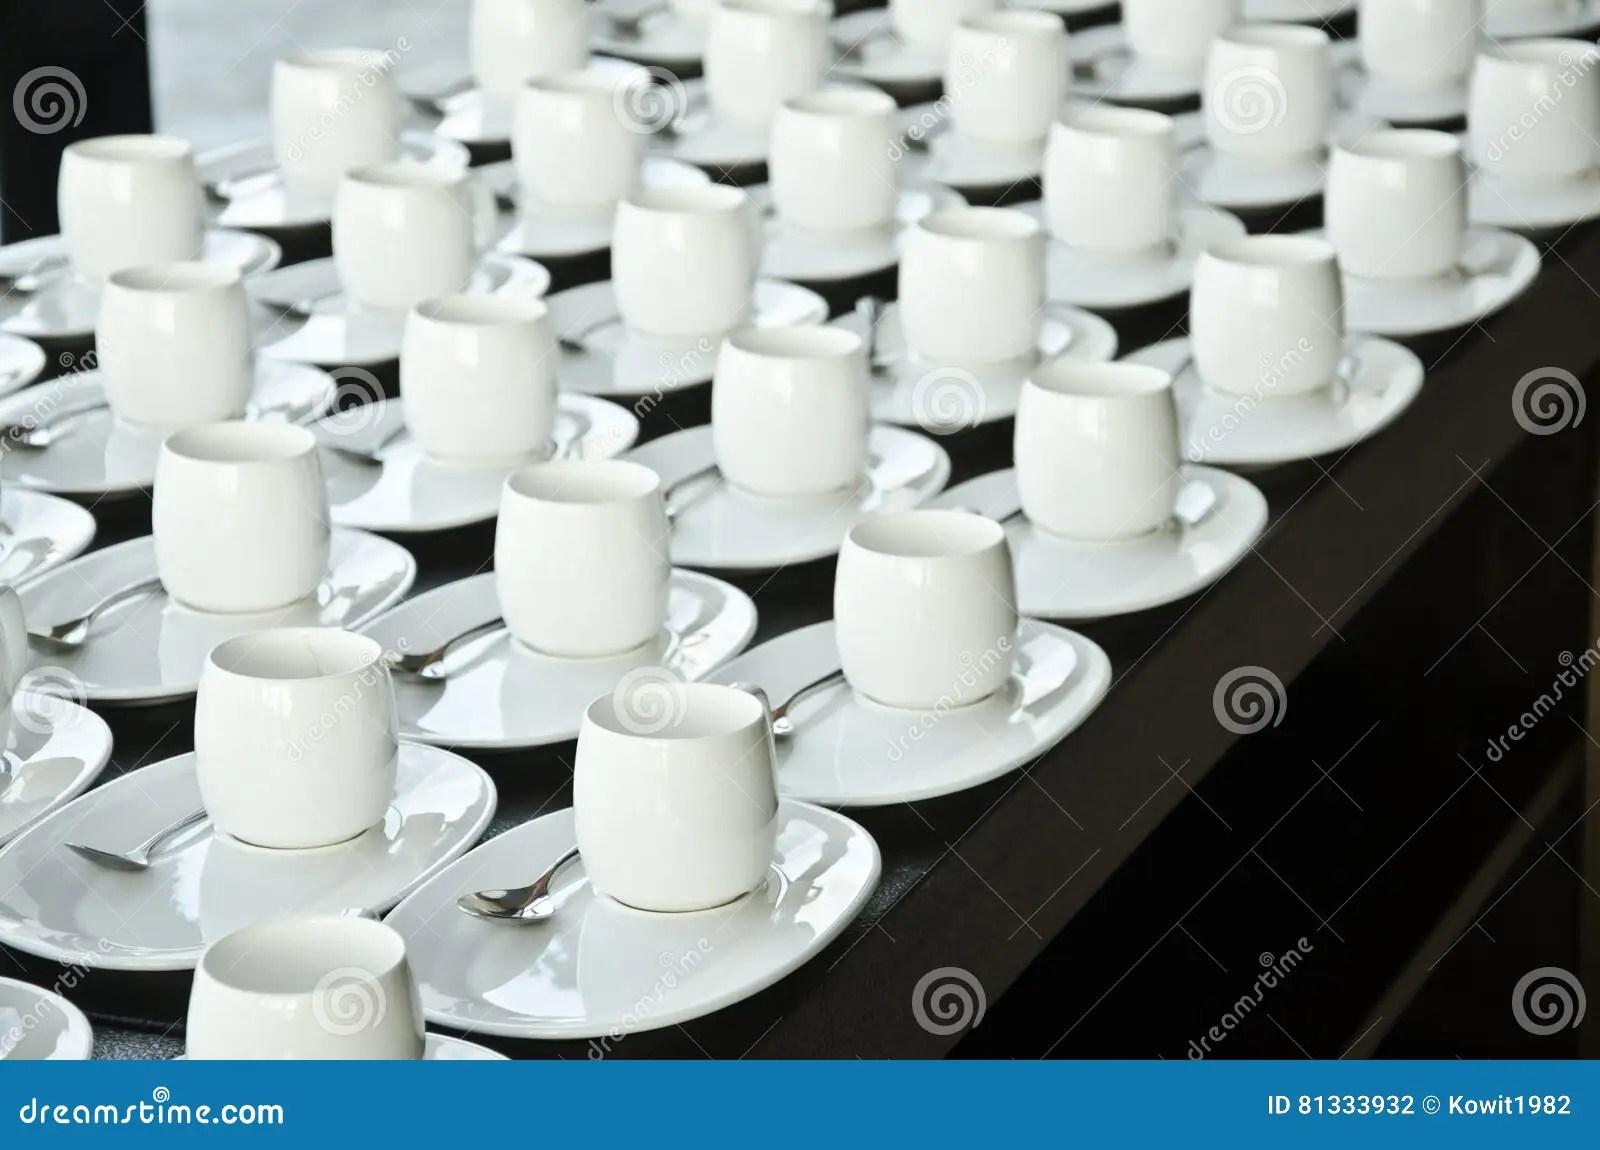 white kitchen buffet the orleans island 小组咖啡杯咖啡的空的杯子白色杯子许多行服务茶或咖啡的在自助餐事件的 小组咖啡杯咖啡的空的杯子白色杯子许多行服务茶或咖啡的在自助餐事件的早餐在承办酒席和鸡尾酒的白色杯子